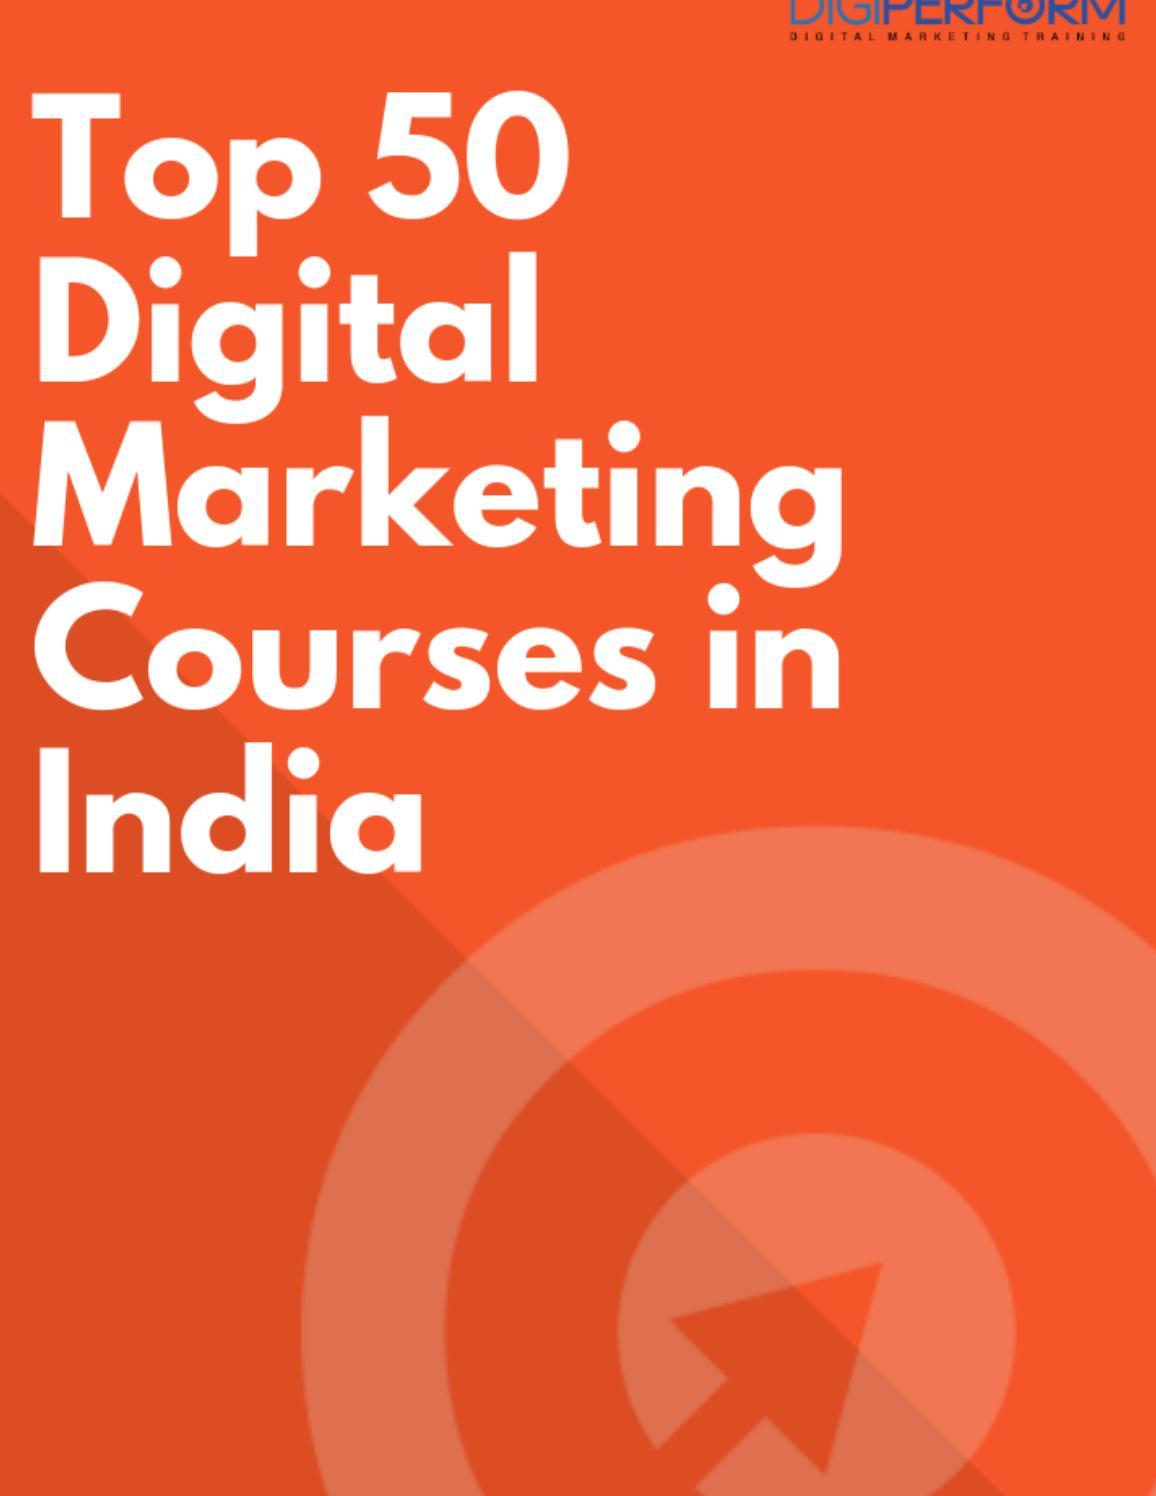 Top 50 Digital Marketing Courses In India By Manju Rai Issuu